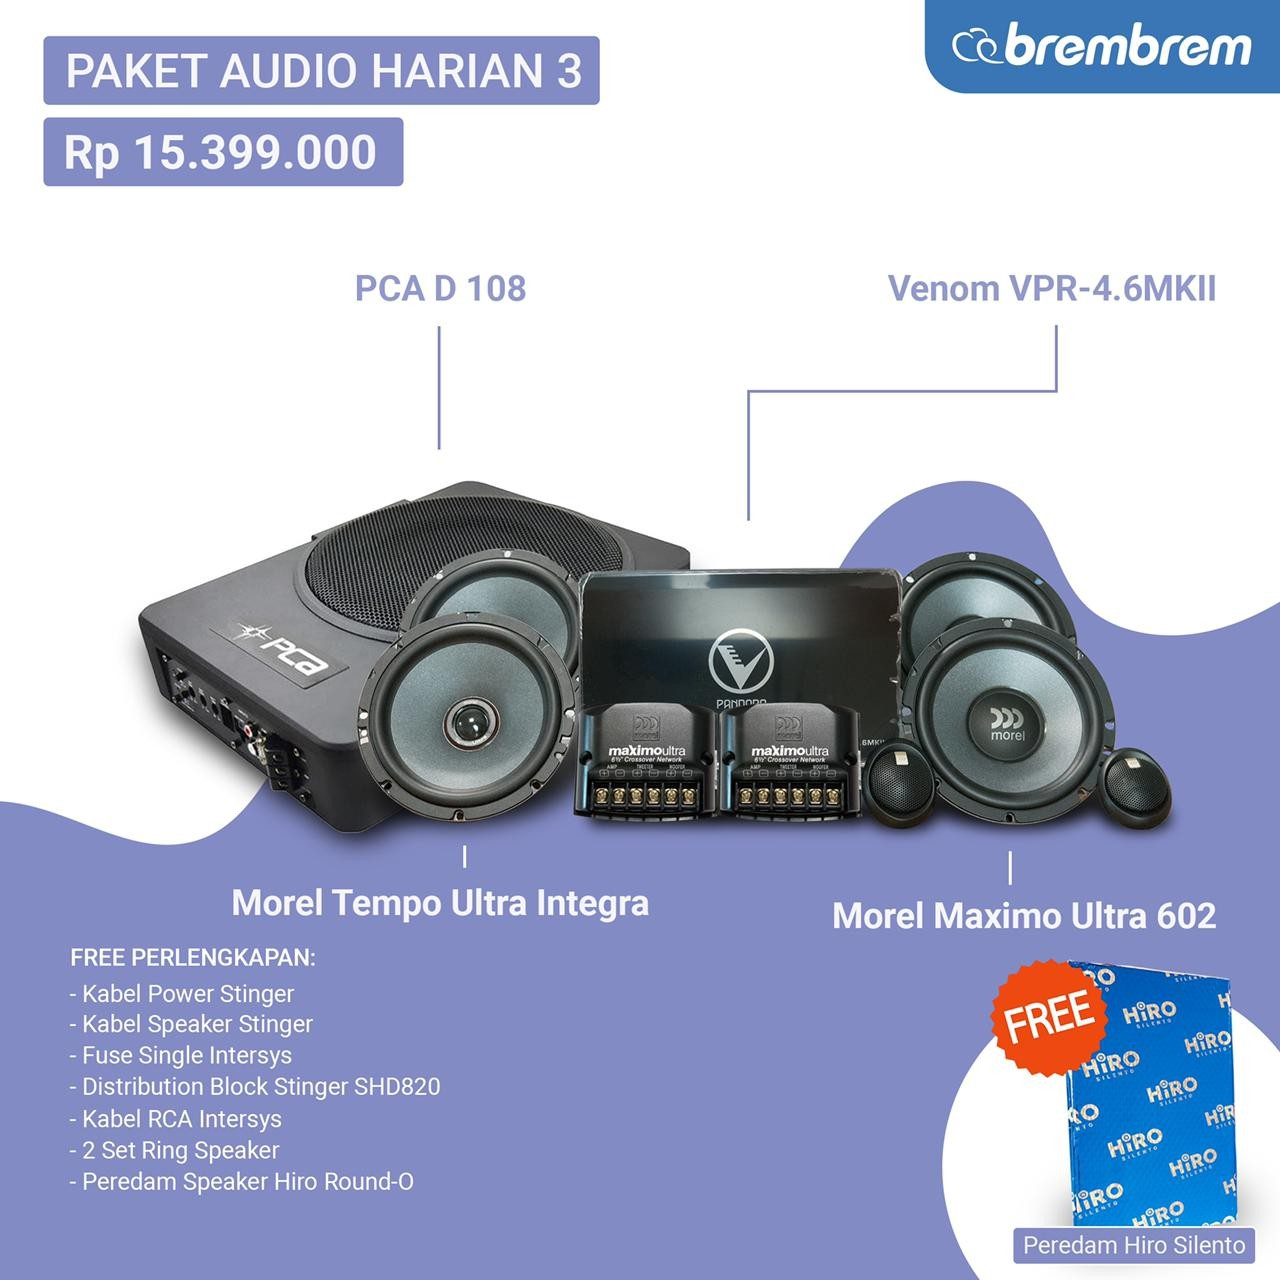 PAKET AUDIO HARIAN 3 - PROMO MENANG BANYAK